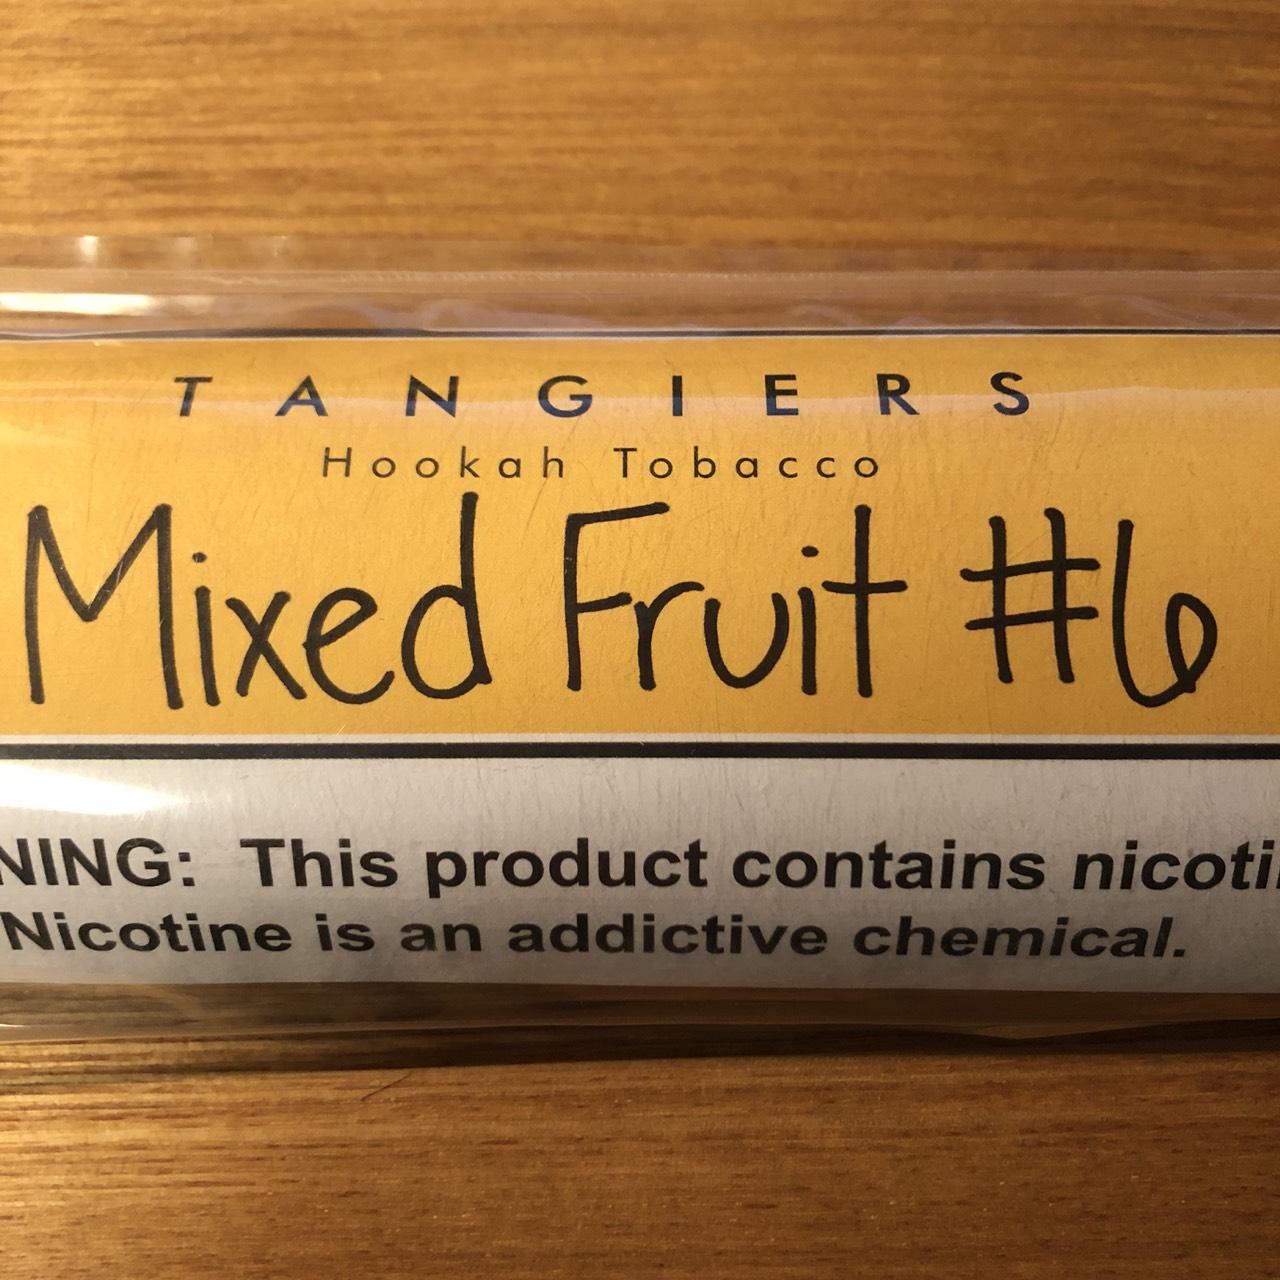 Tangiers Noir / Mixed Fruit #6(スッキリしたGrapefruit系に、トロピカルフルーツっぽい香りが少々)